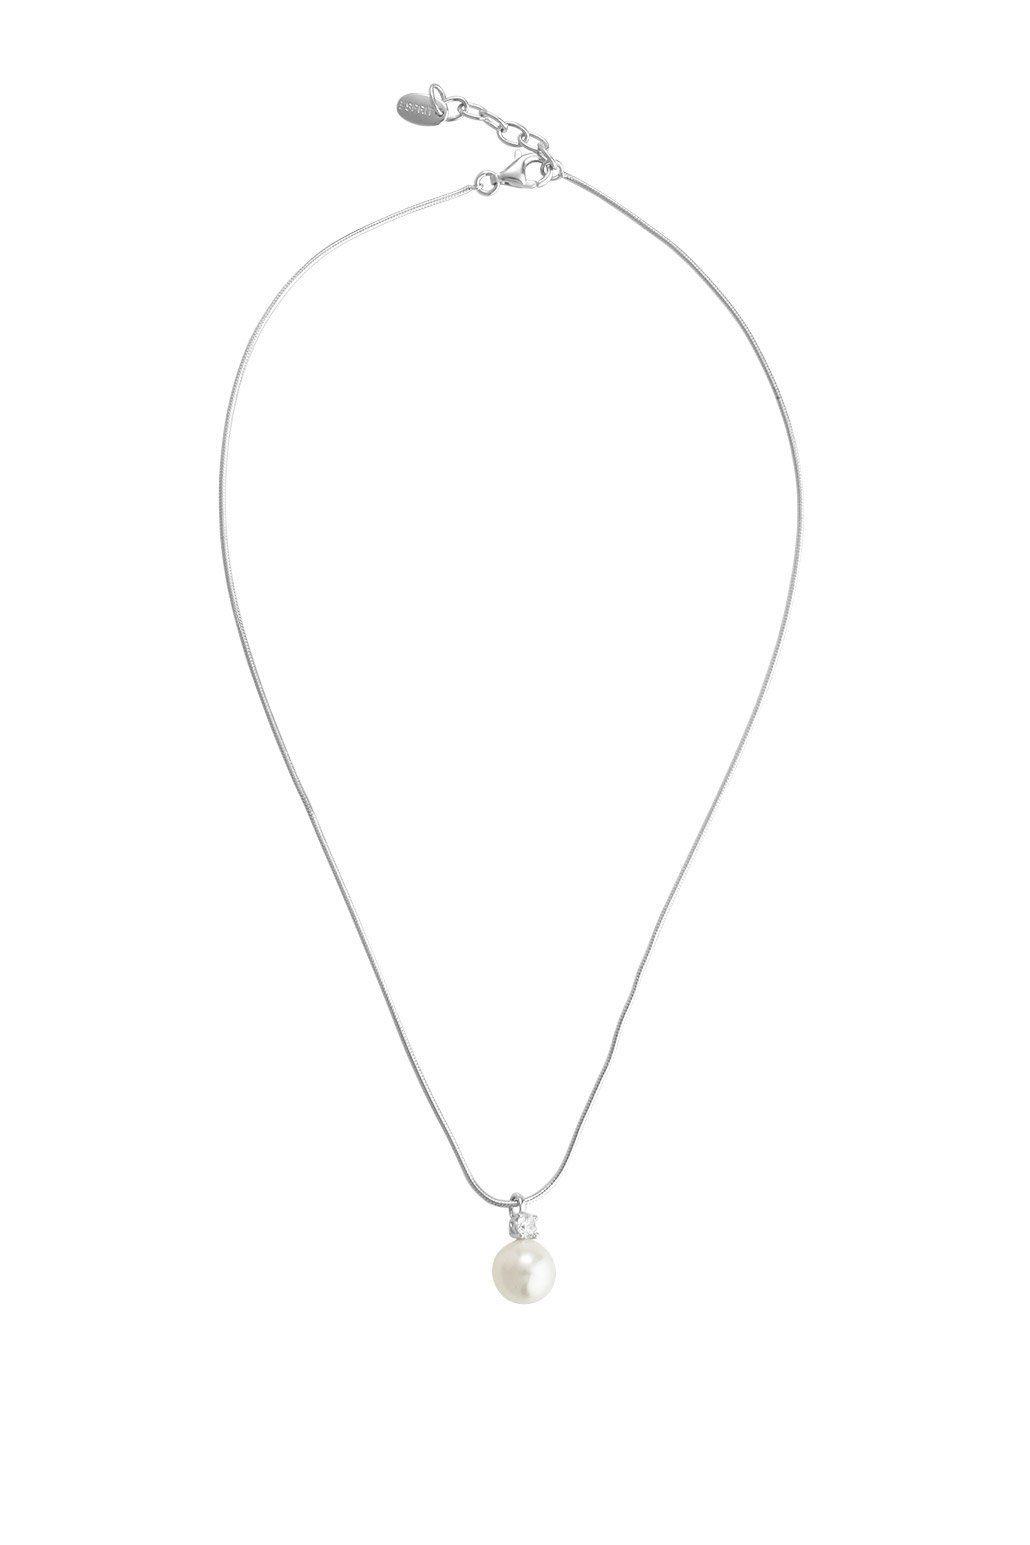 ESPRIT CASUAL Sterling Silber / Zirkonia / Glasperle